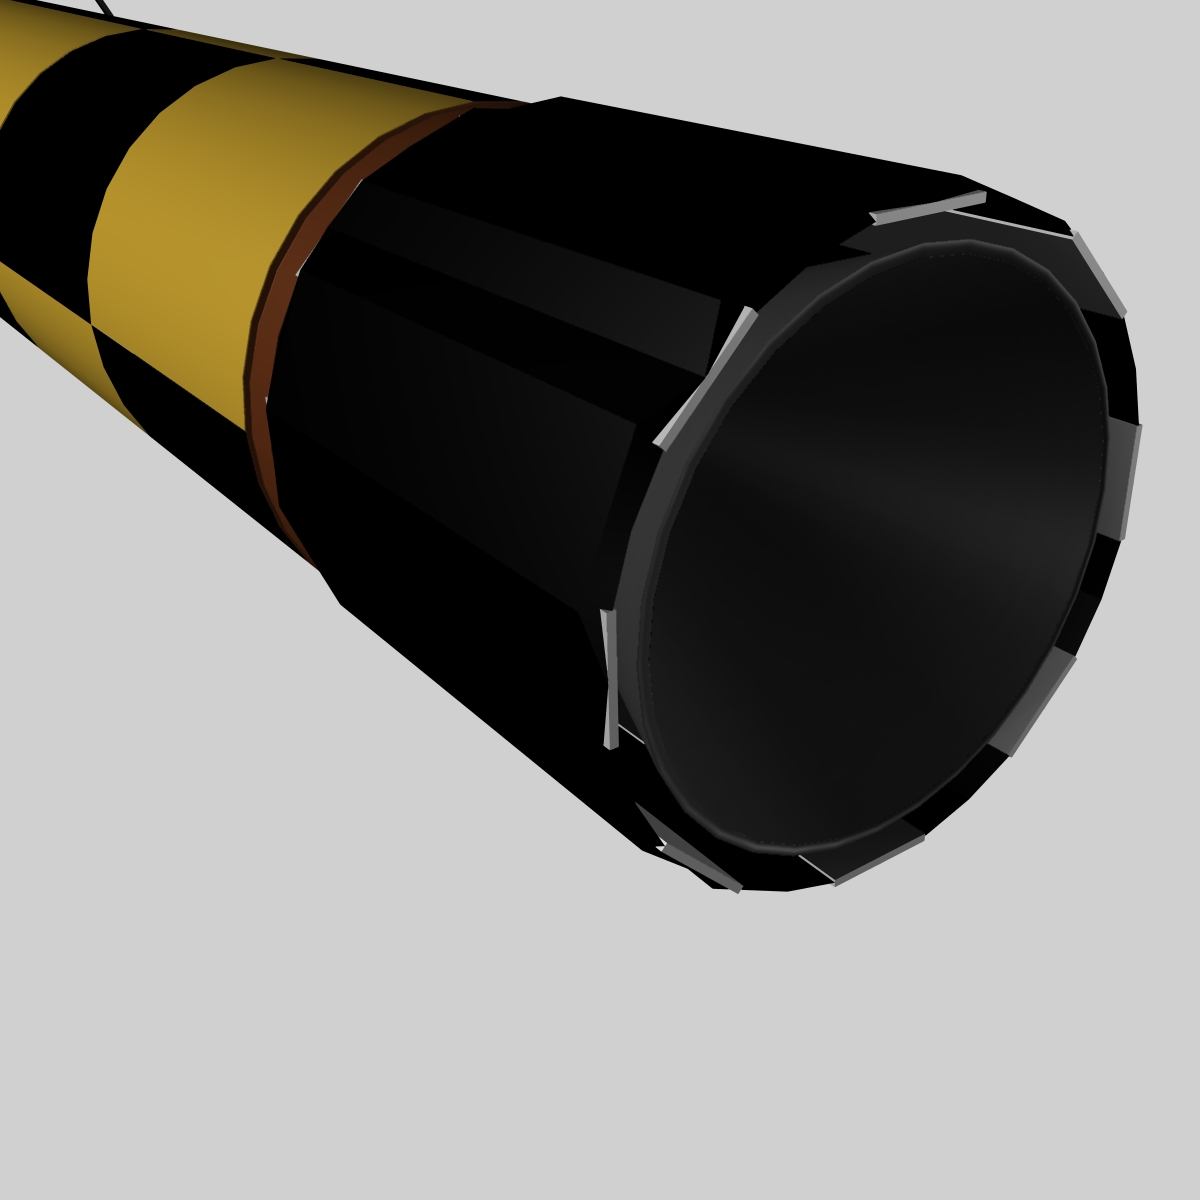 israeli arrow 3 missile 3d model 3ds dxf cob x other obj 136288